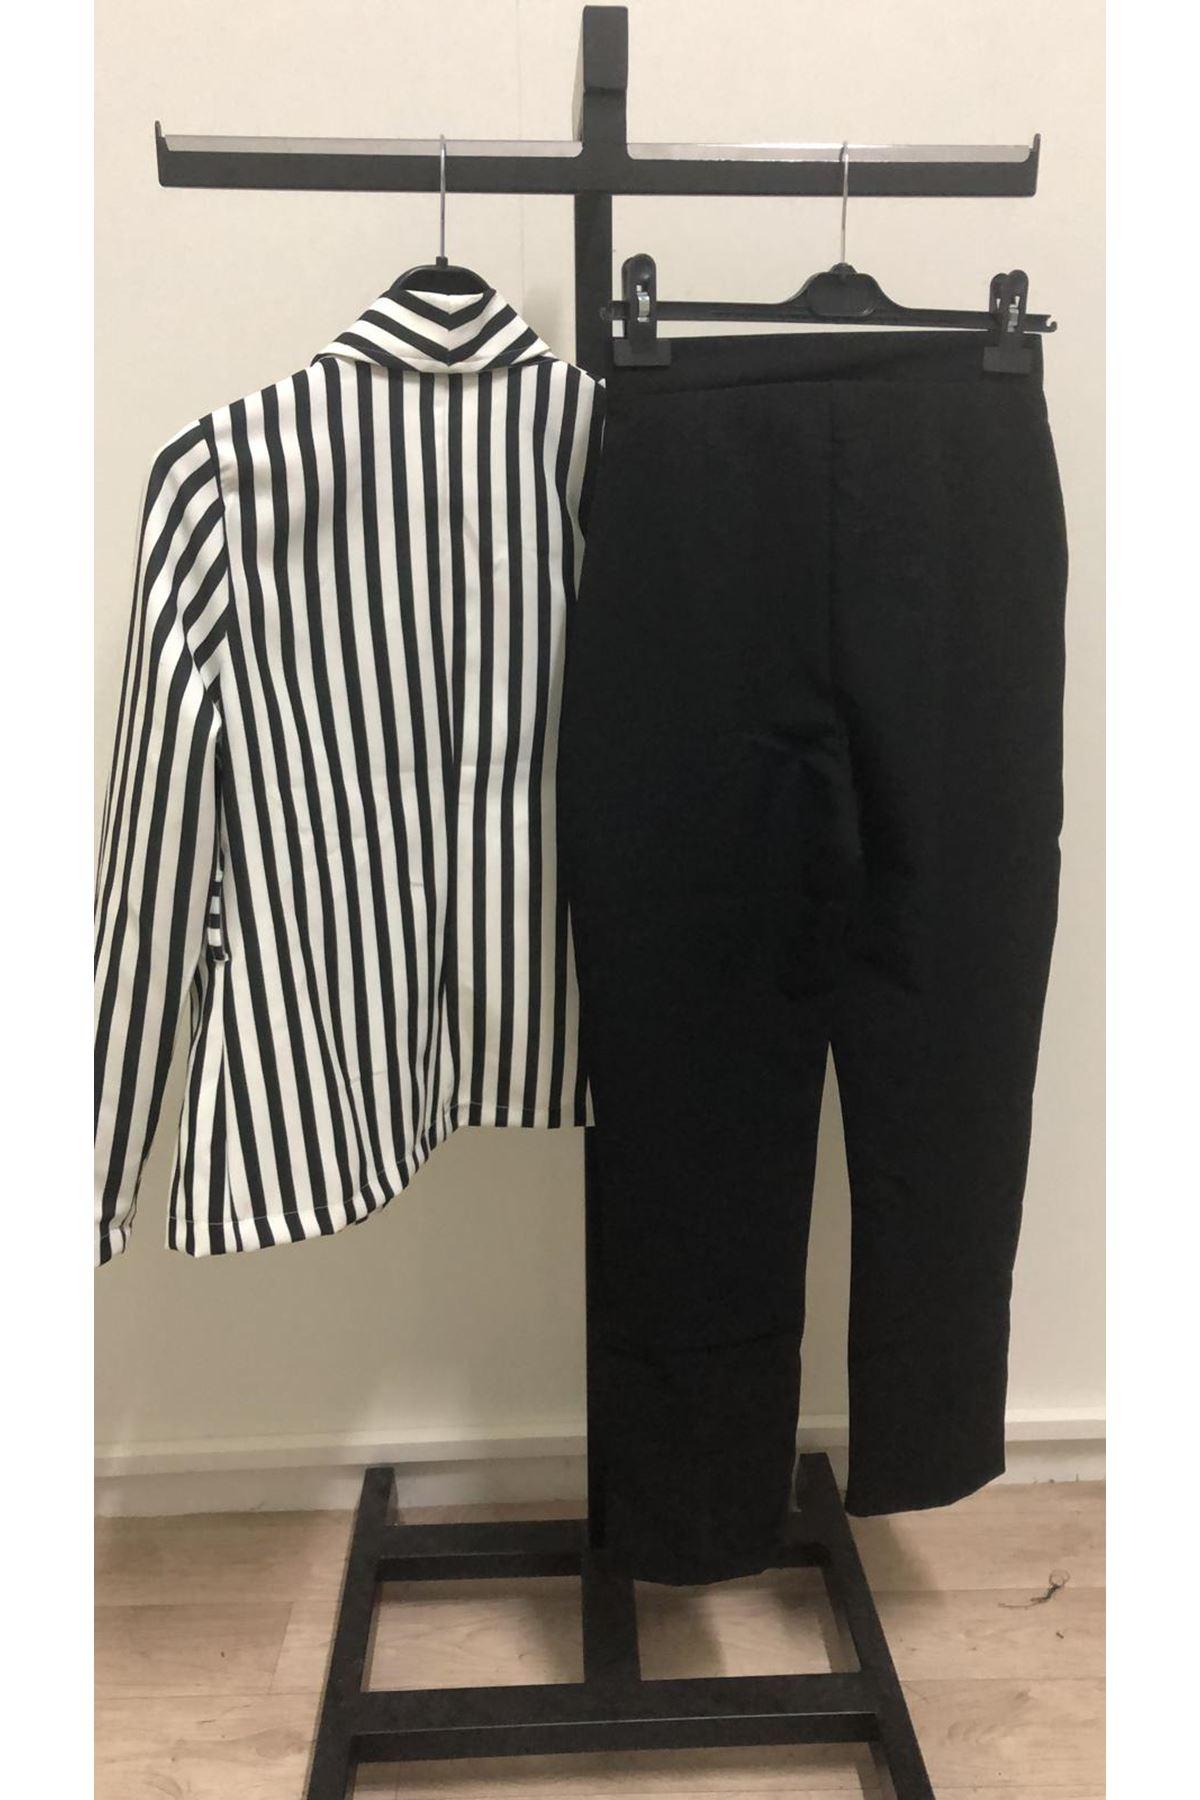 Çizgi Ceketli İkili Takım - siyah